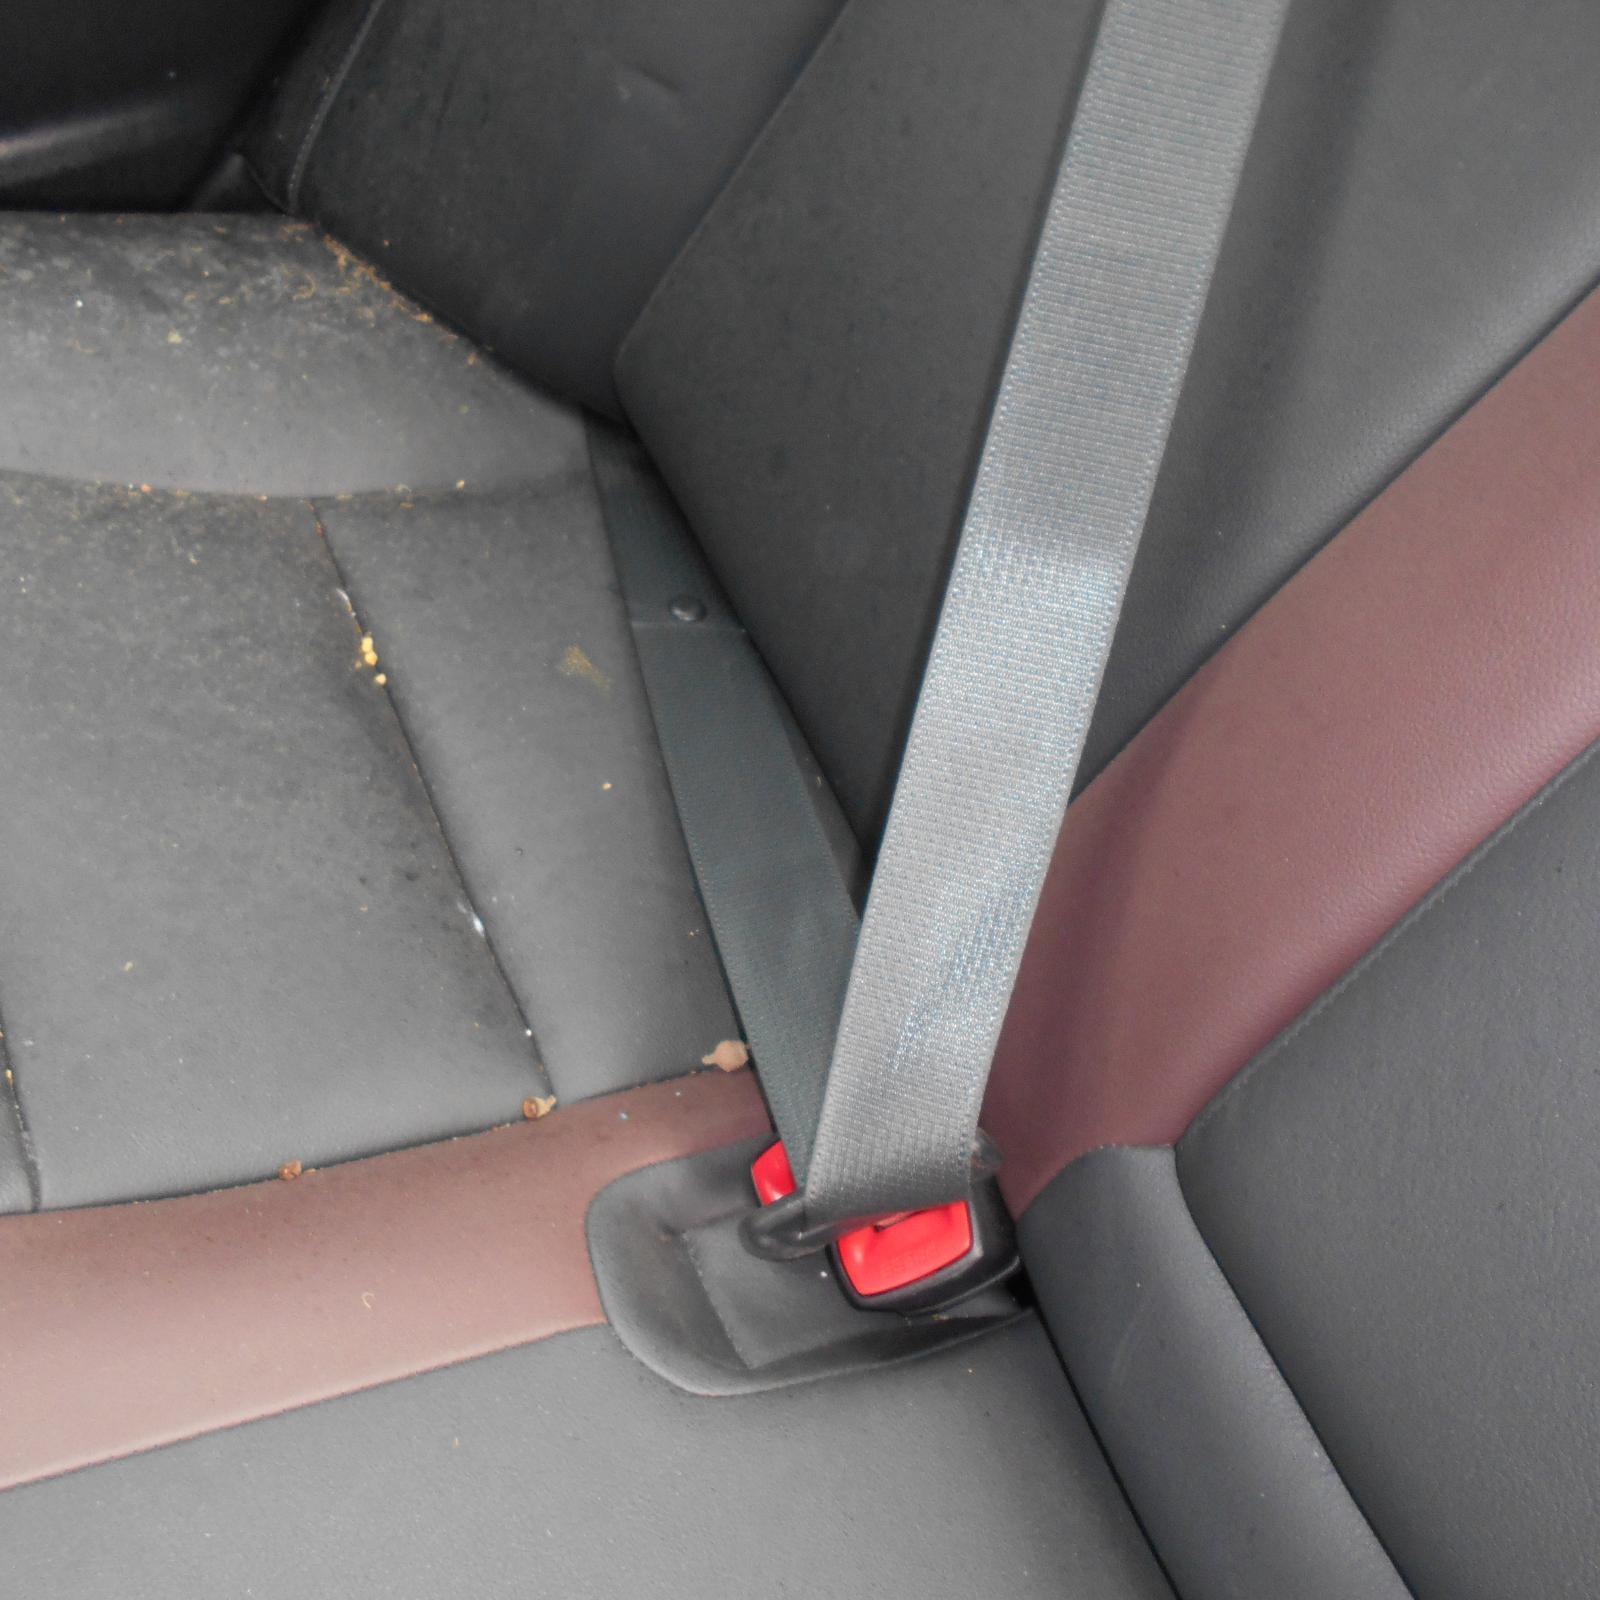 TOYOTA AURION, Seatbelt/Stalk, RH REAR, SEAT BELT ONLY, GSV50R, 04/12-08/17